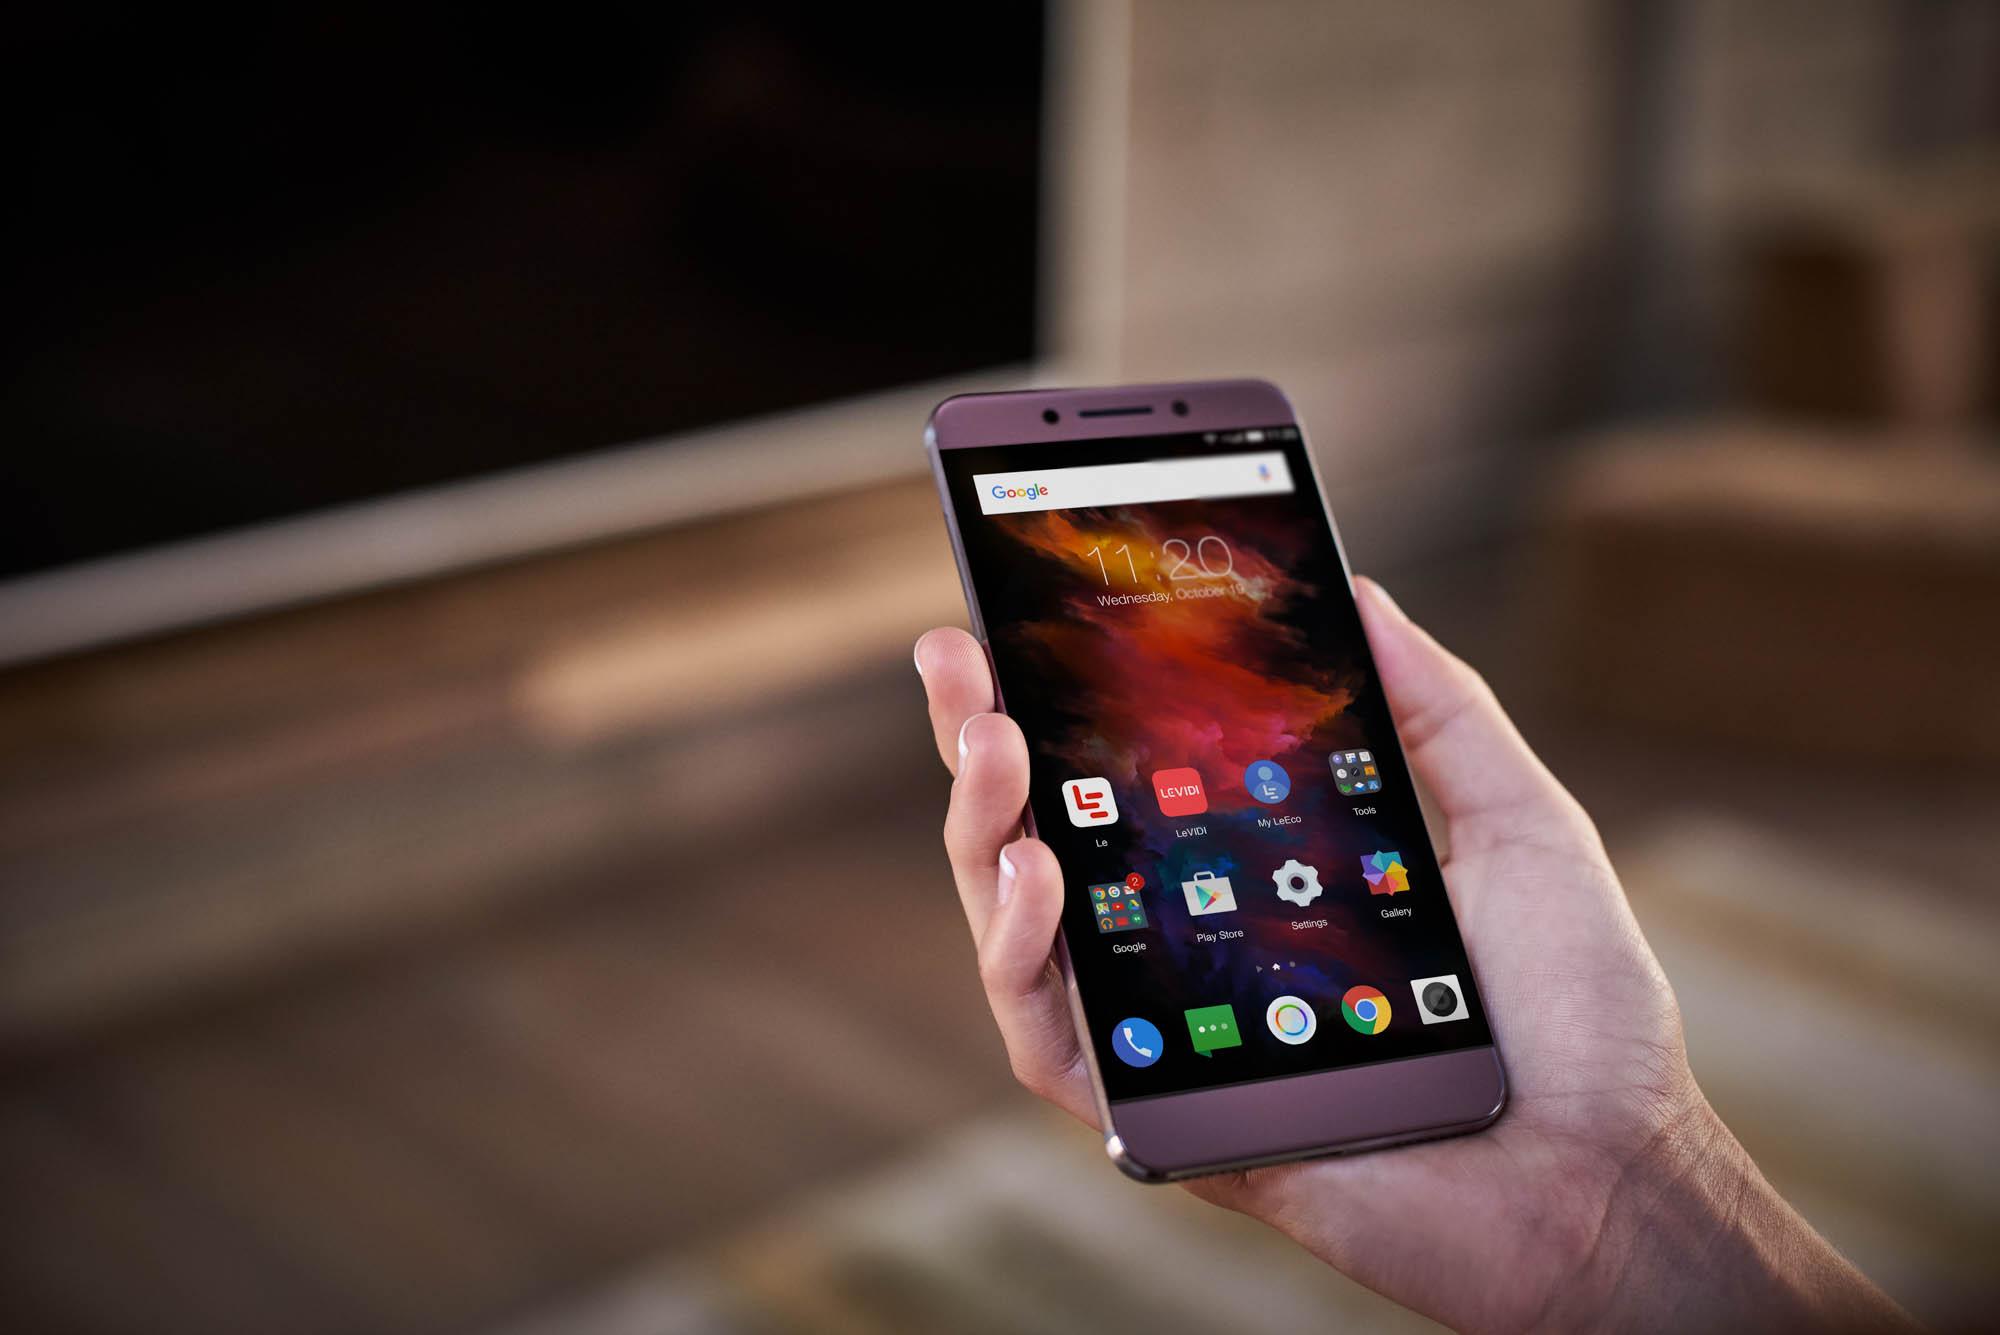 LeEco phone in hand